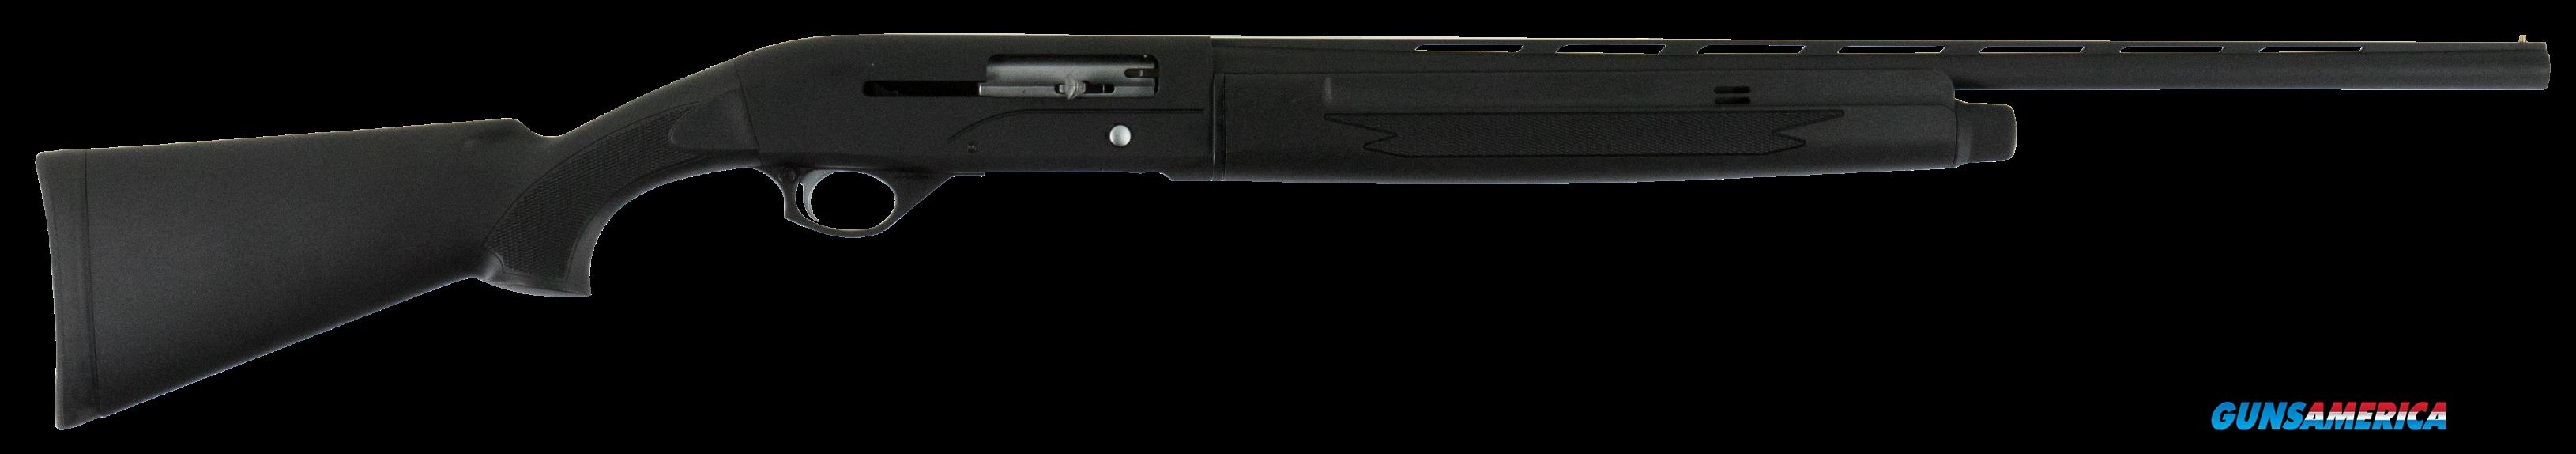 Mossberg Sa-28, Moss 75769 Sa28 28ga 24vr Syn Yth  Guns > Pistols > 1911 Pistol Copies (non-Colt)